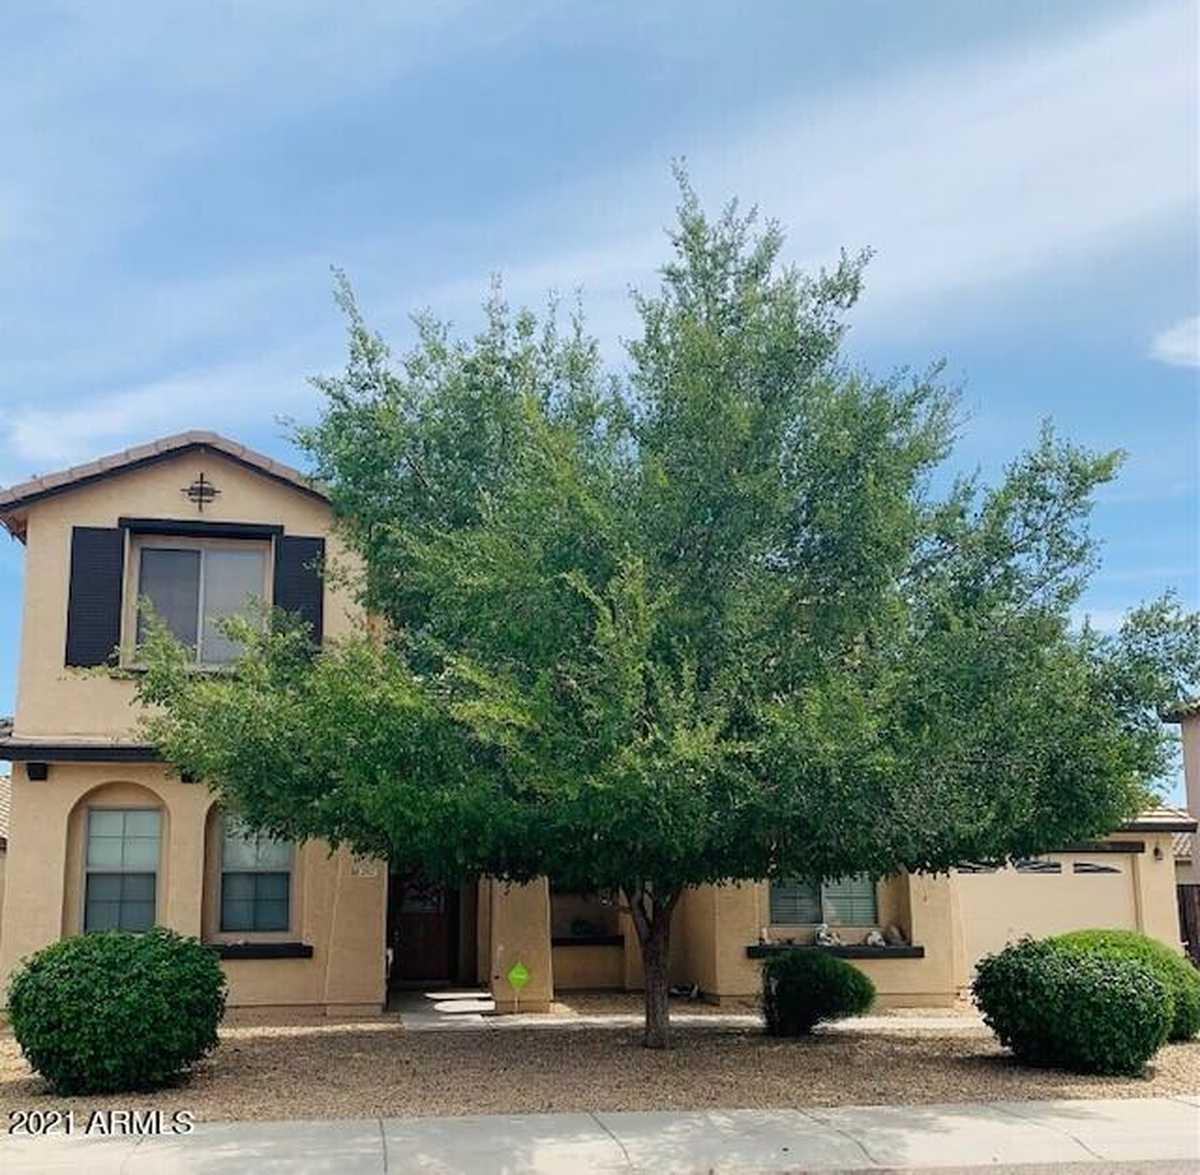 $430,000 - 5Br/3Ba - Home for Sale in Mosaic At Estrella Village, Phoenix